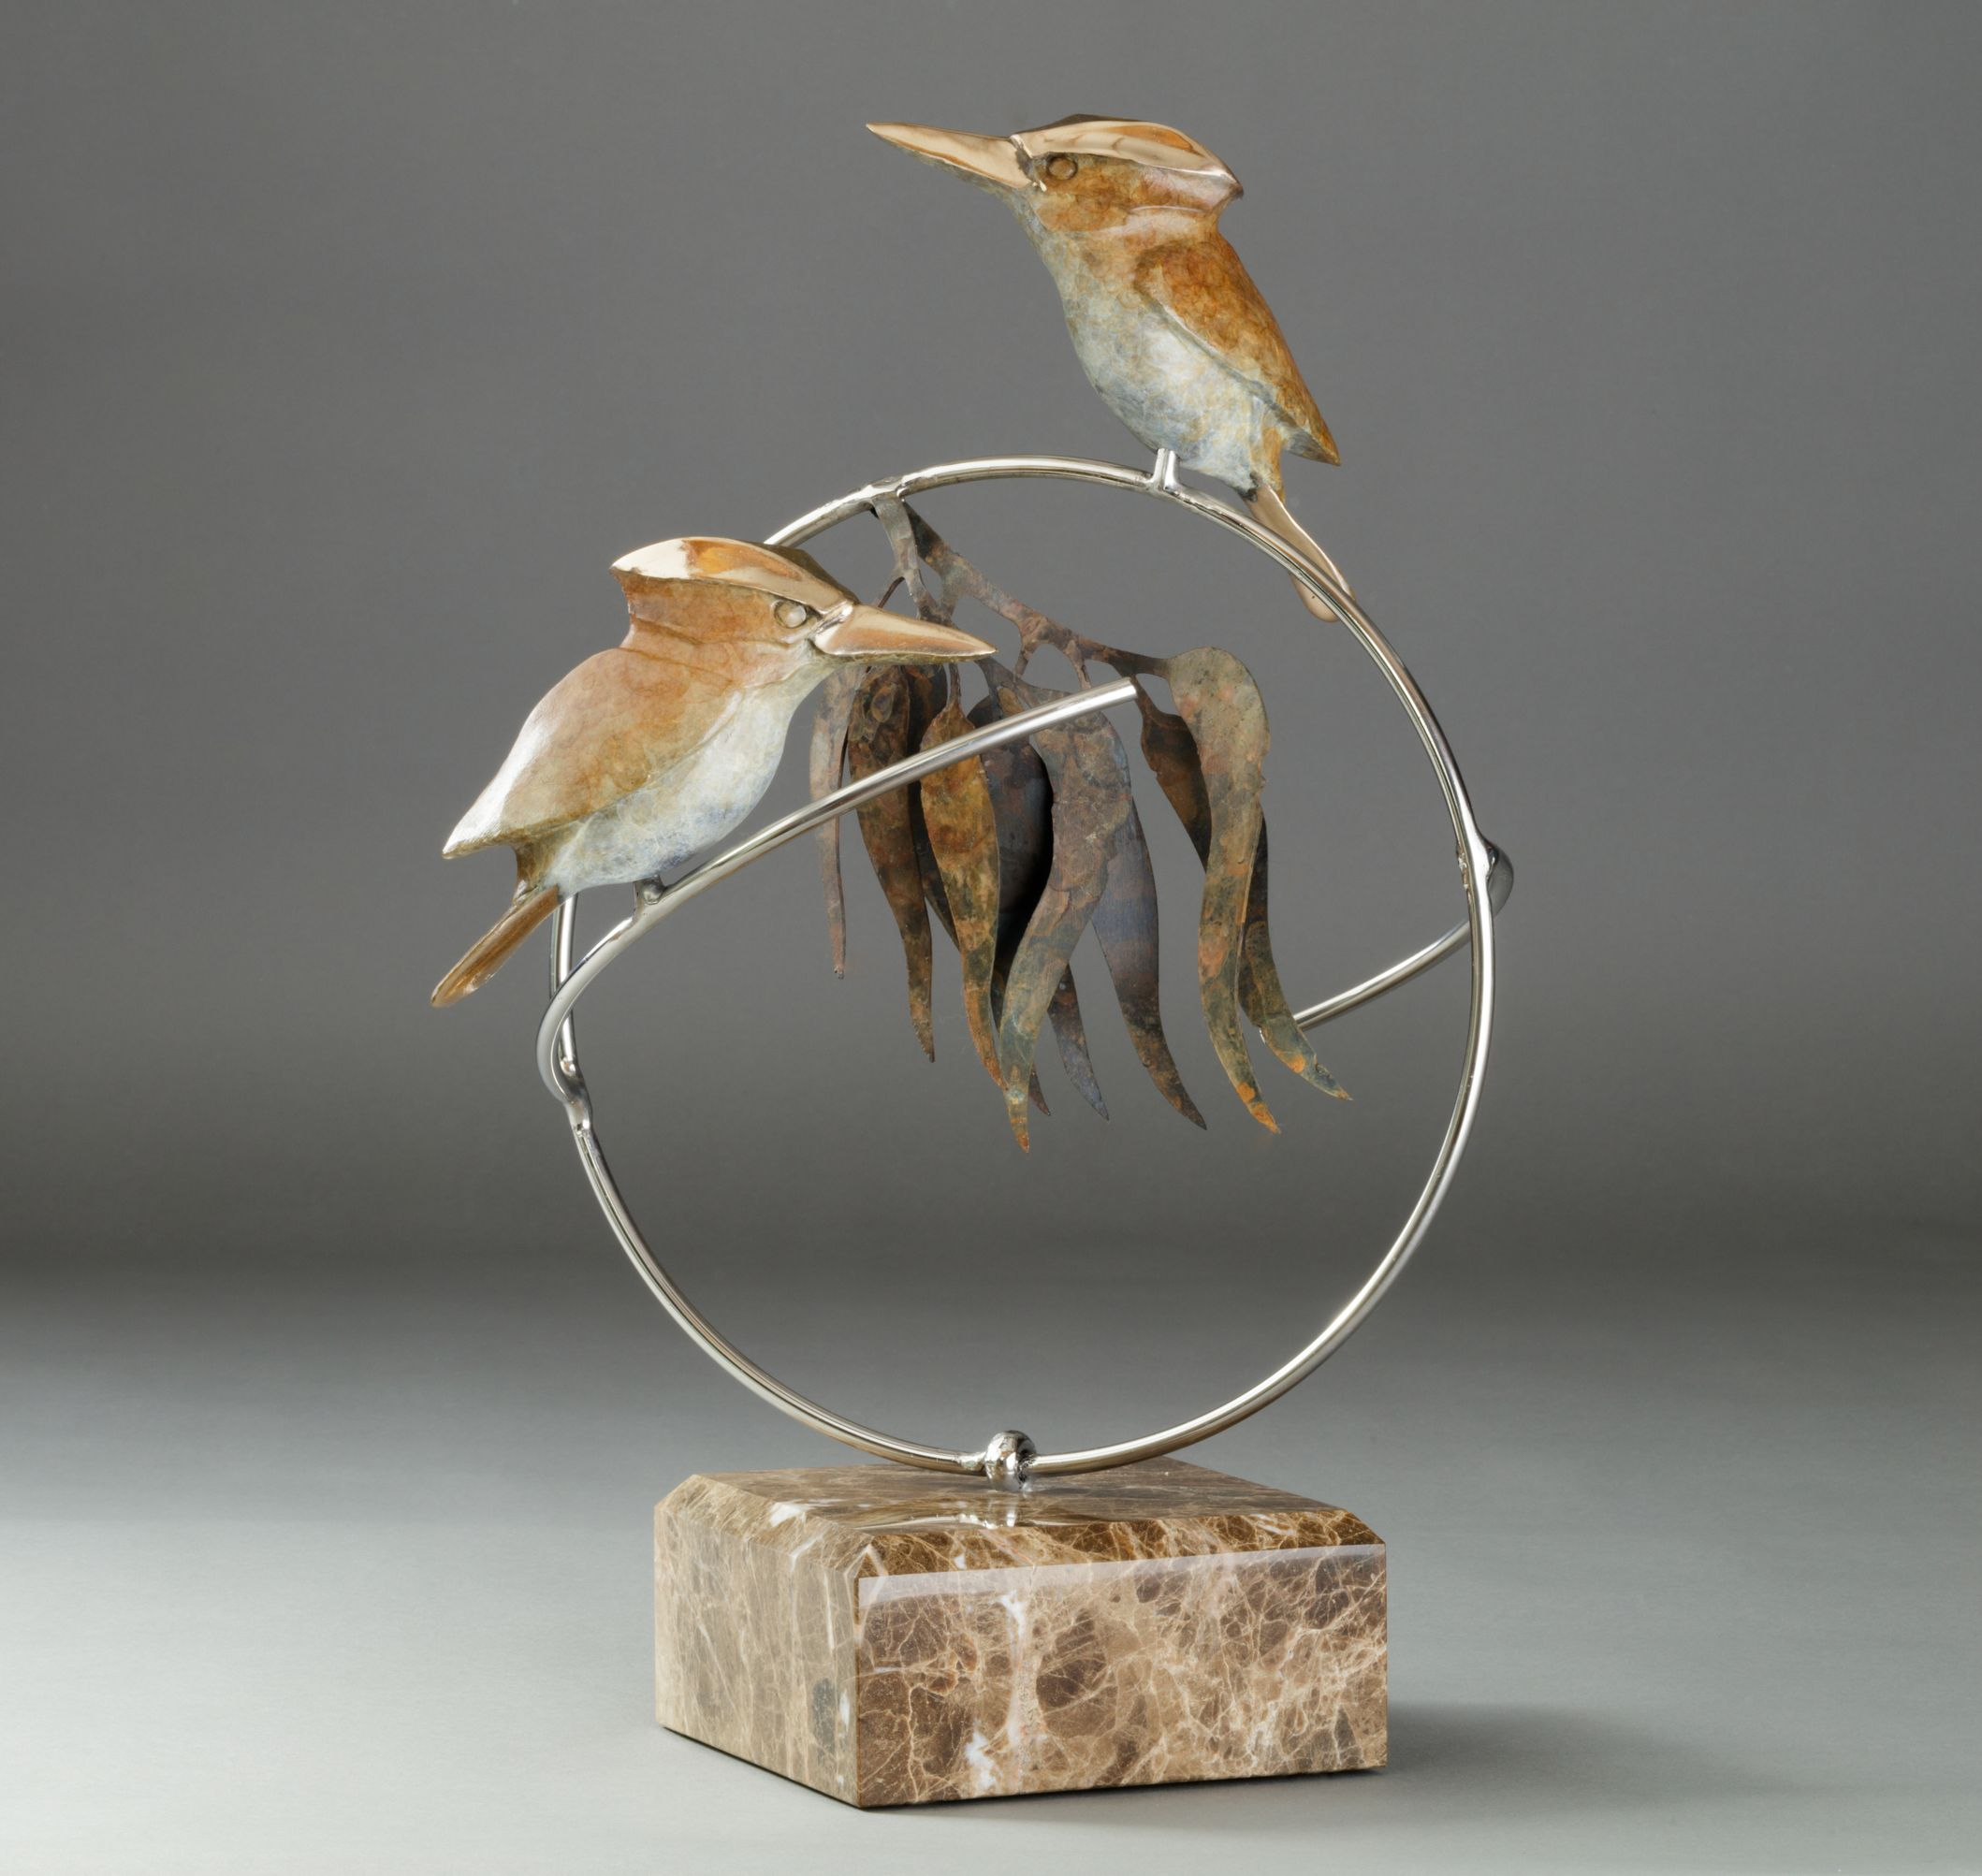 A Pair of Kookaburras